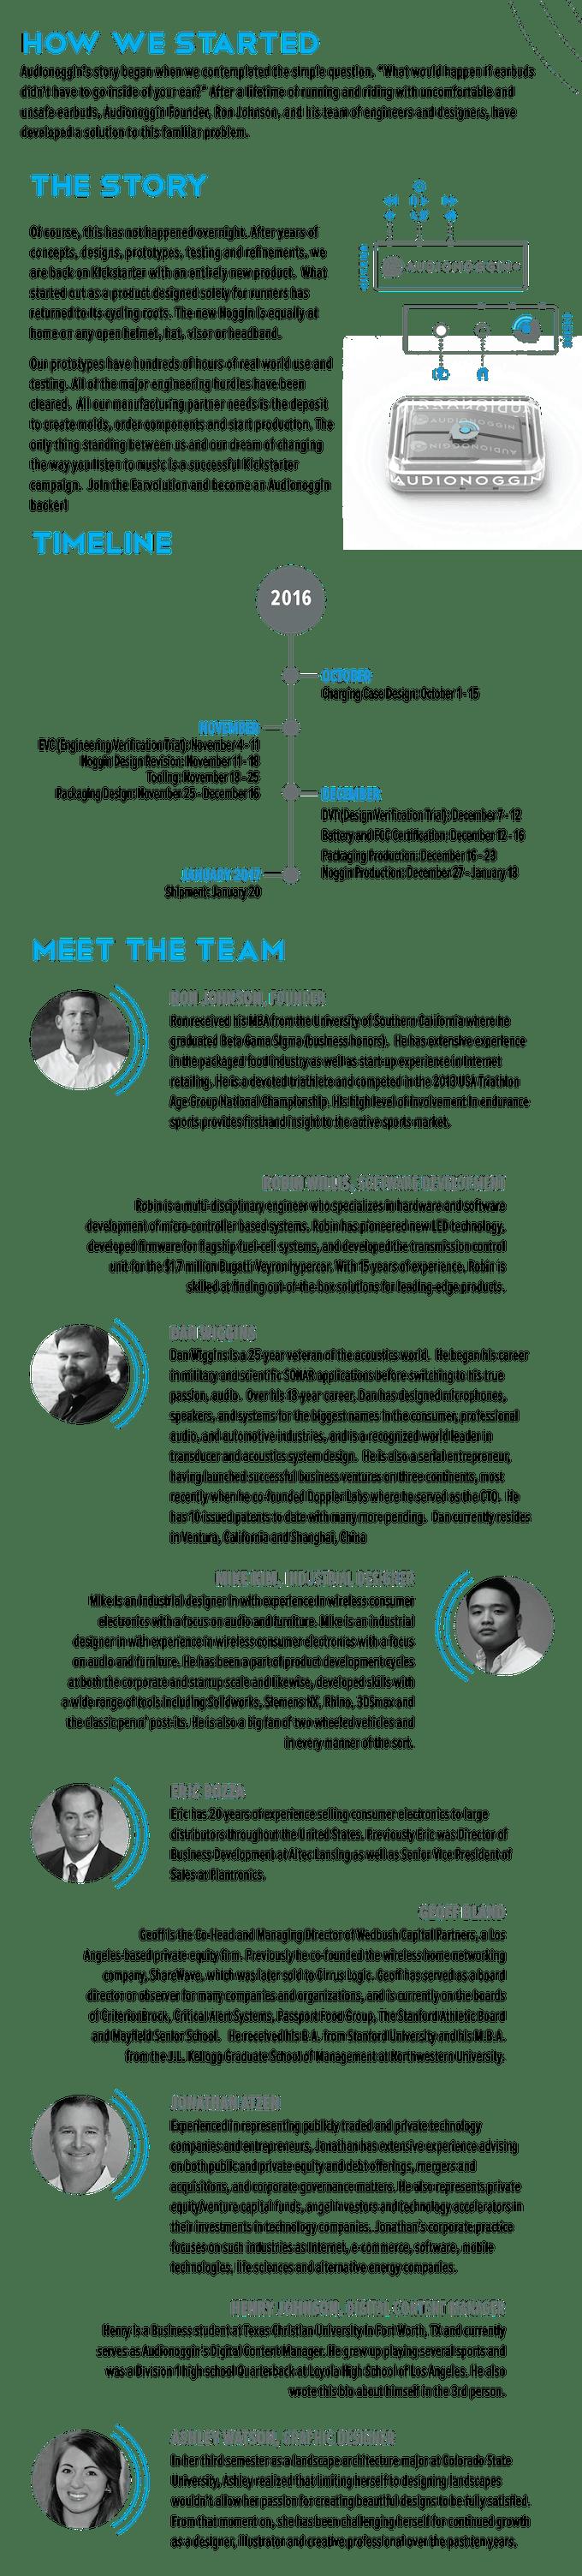 About Audionoggin